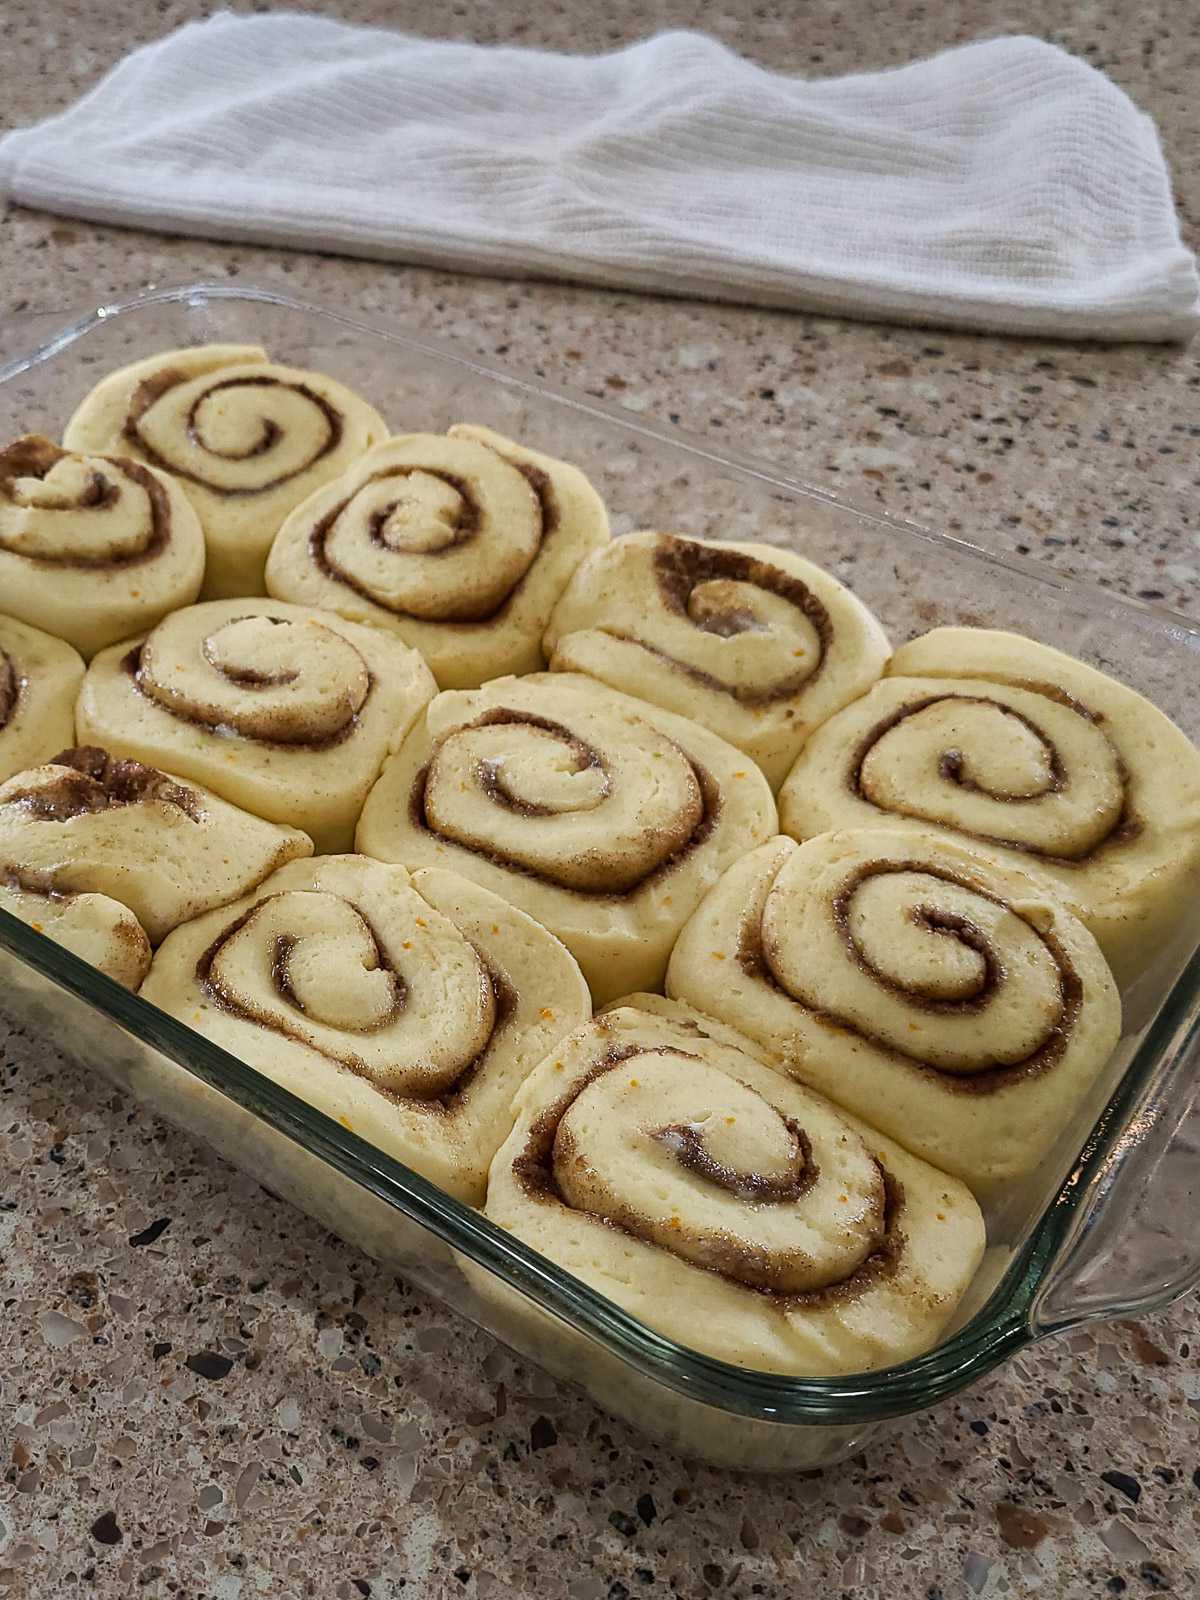 raised cinnamon rolls ready to bake